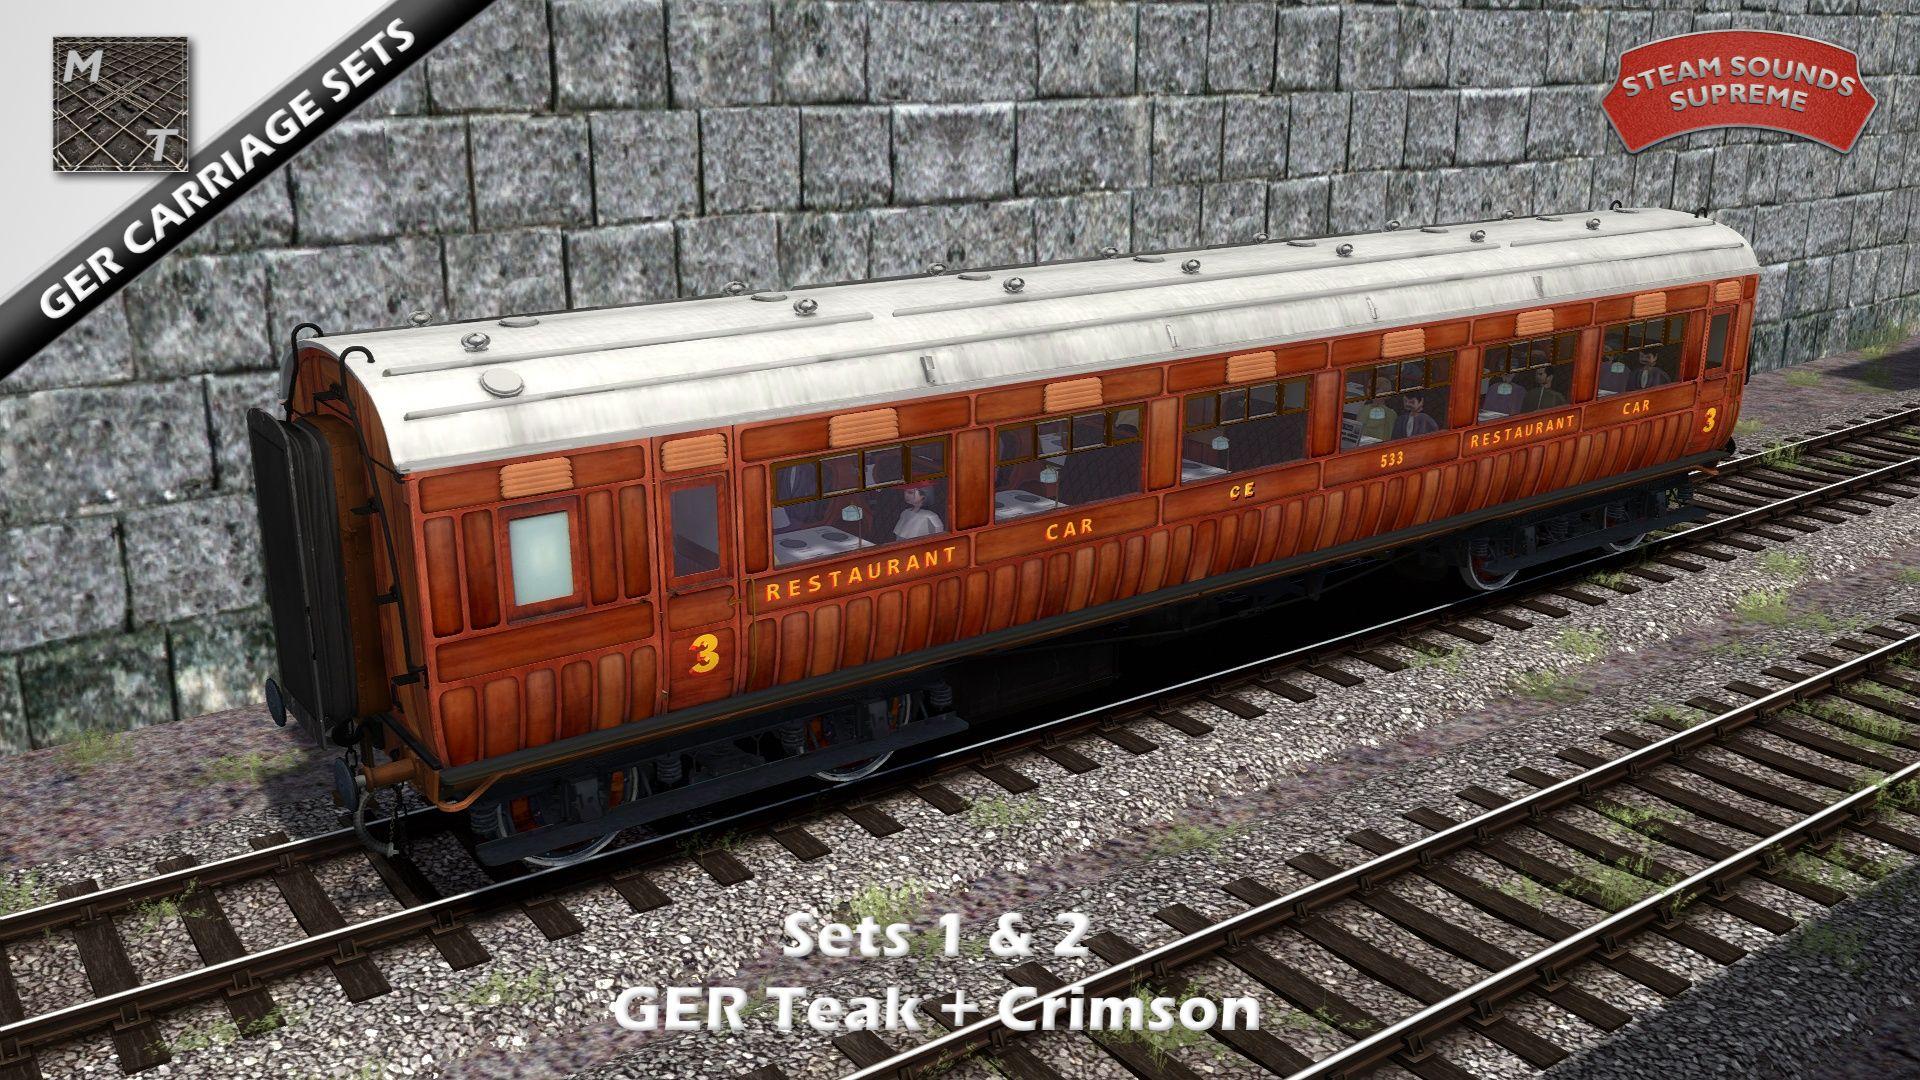 GERCorrSet1-2_08.jpg